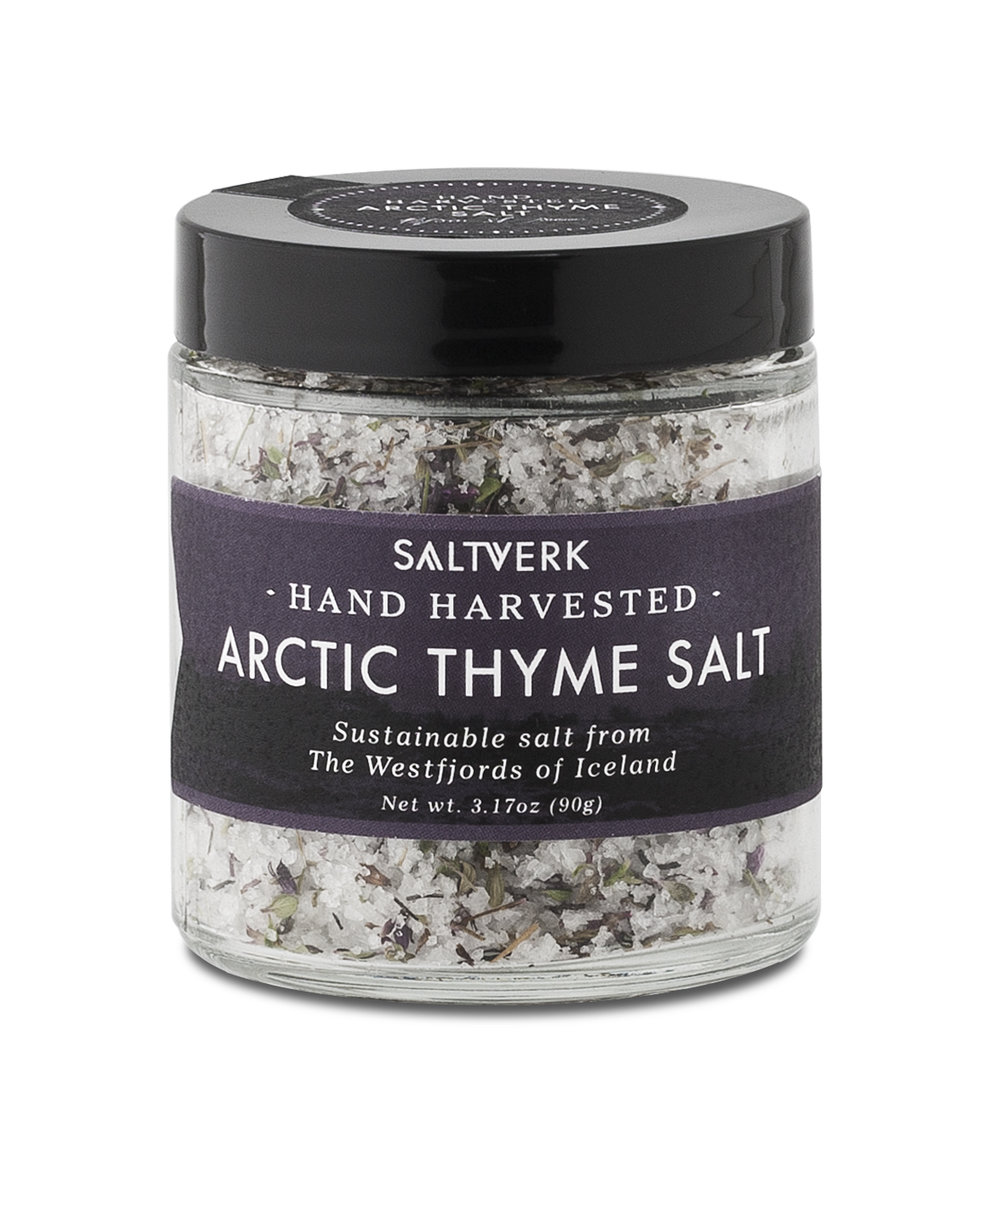 Arctic thyme salt - $13